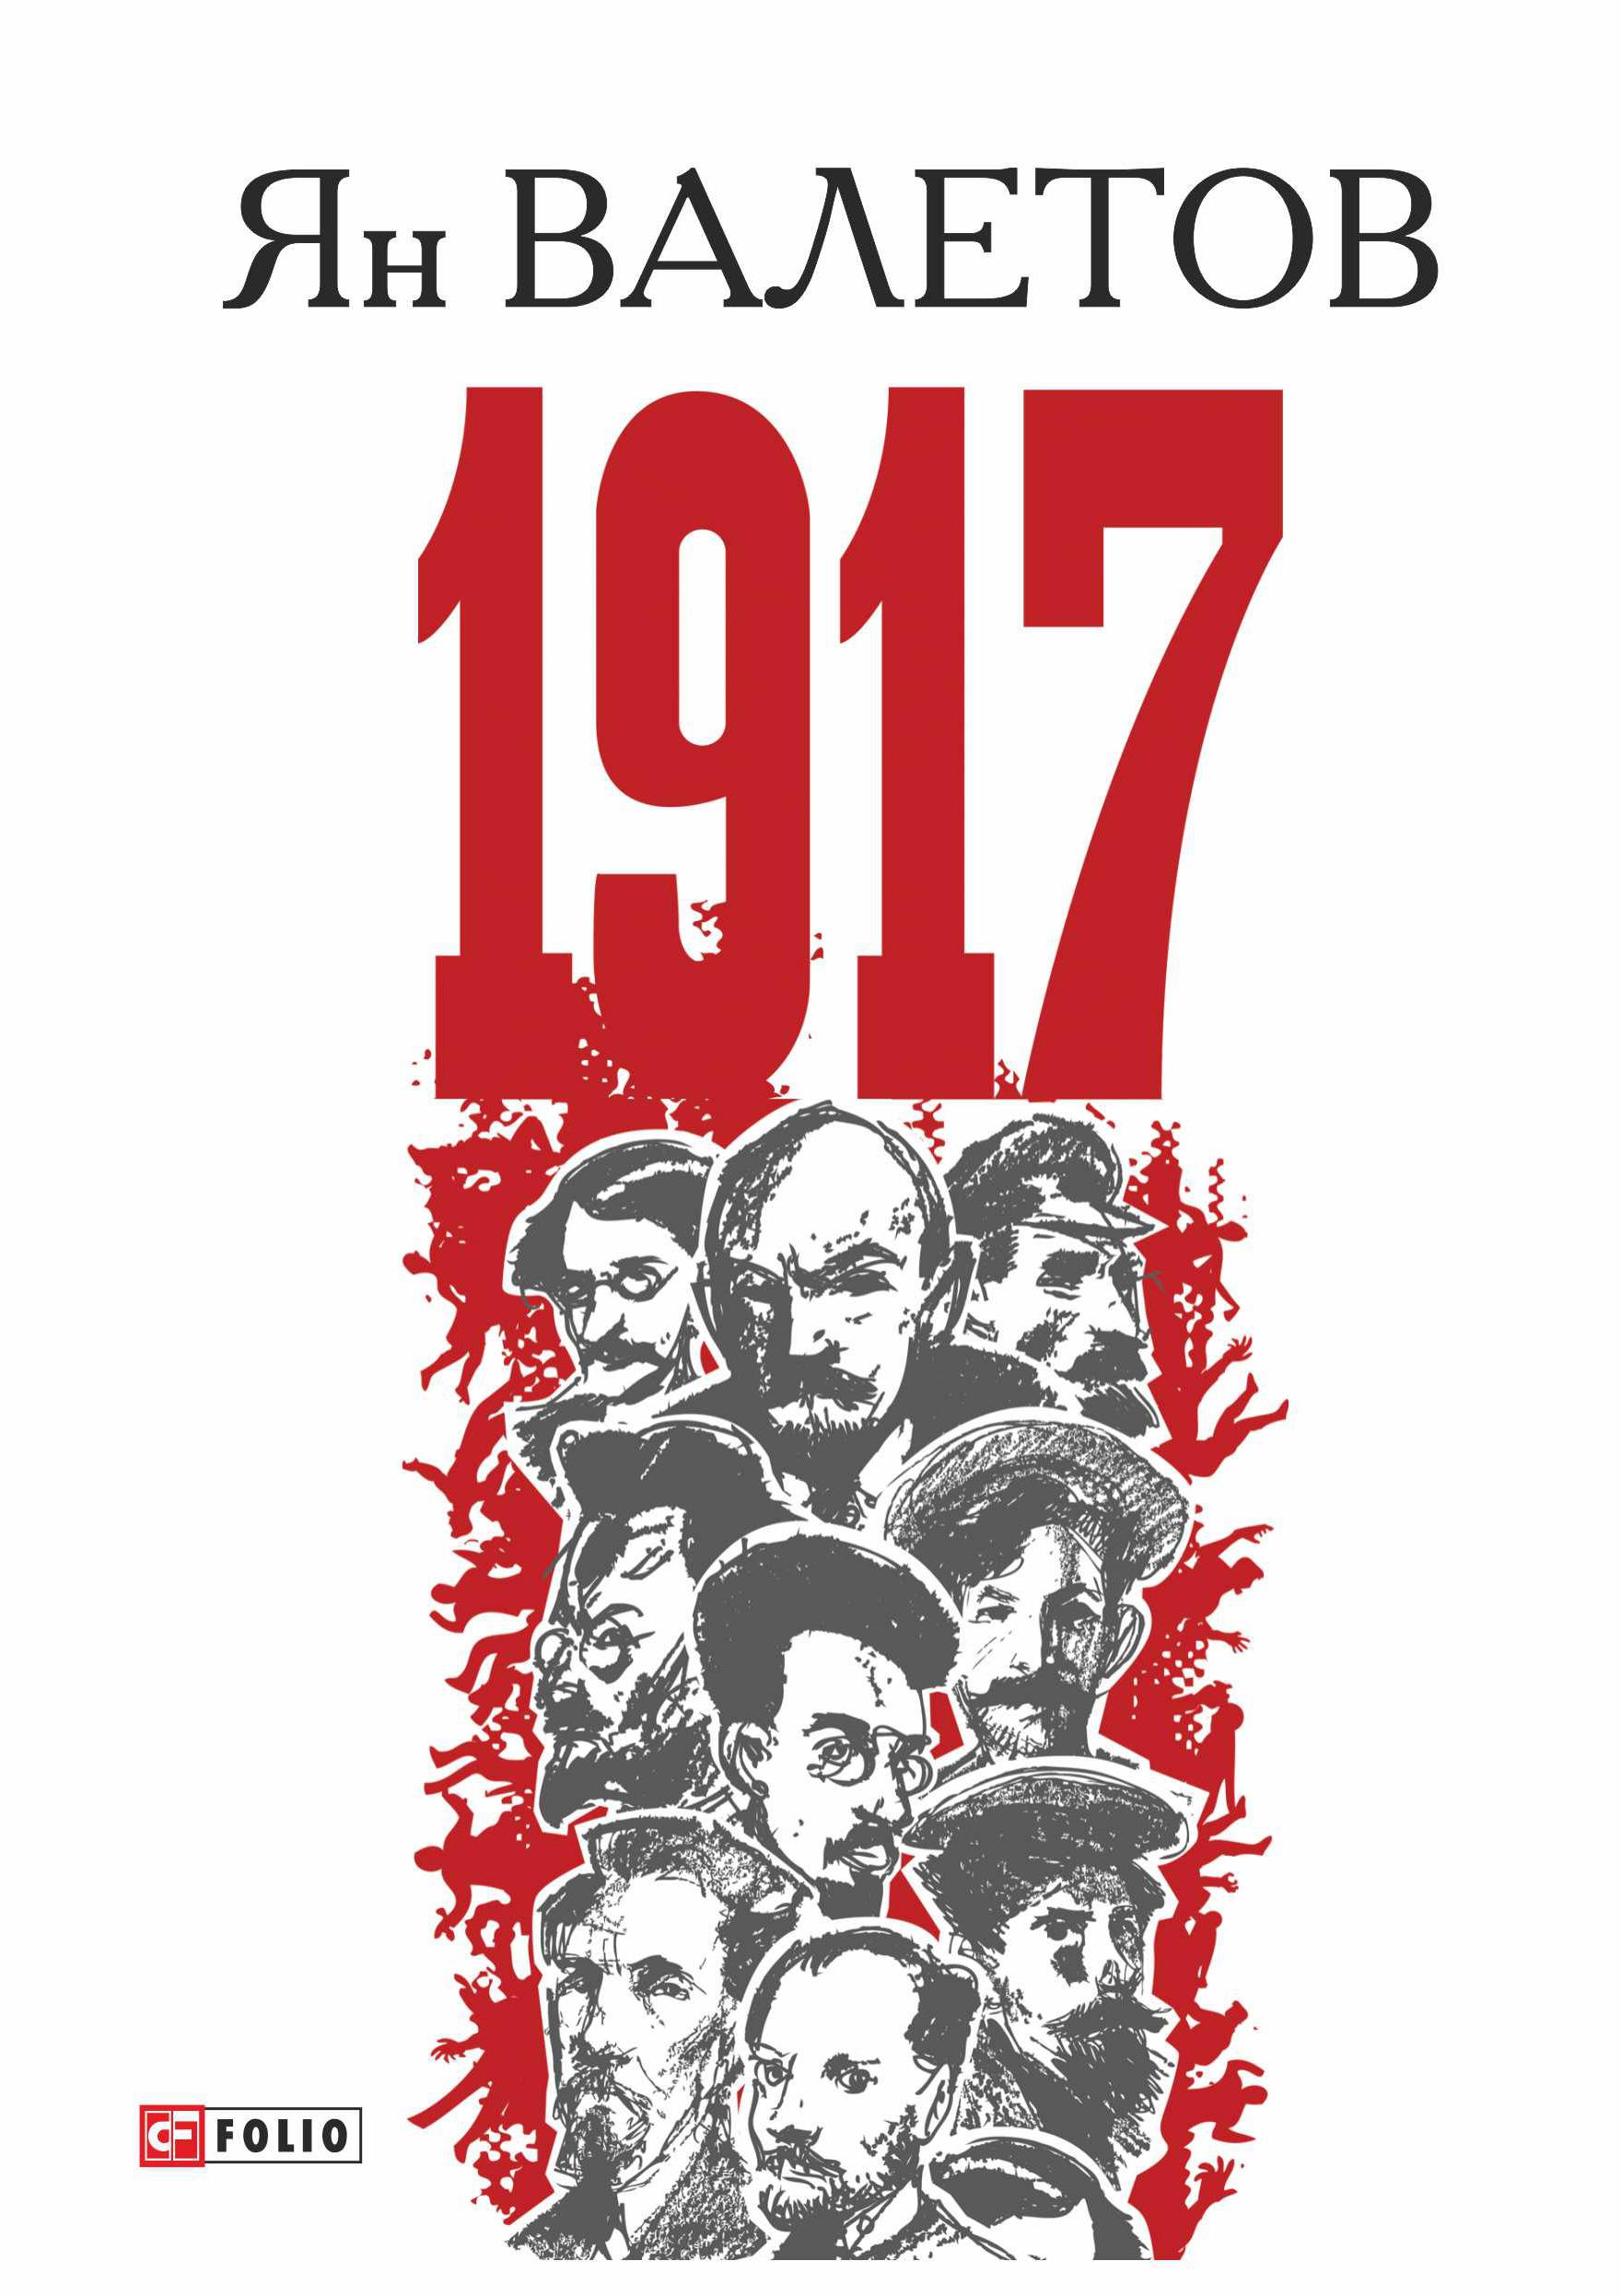 1917 ili dni otchayaniya